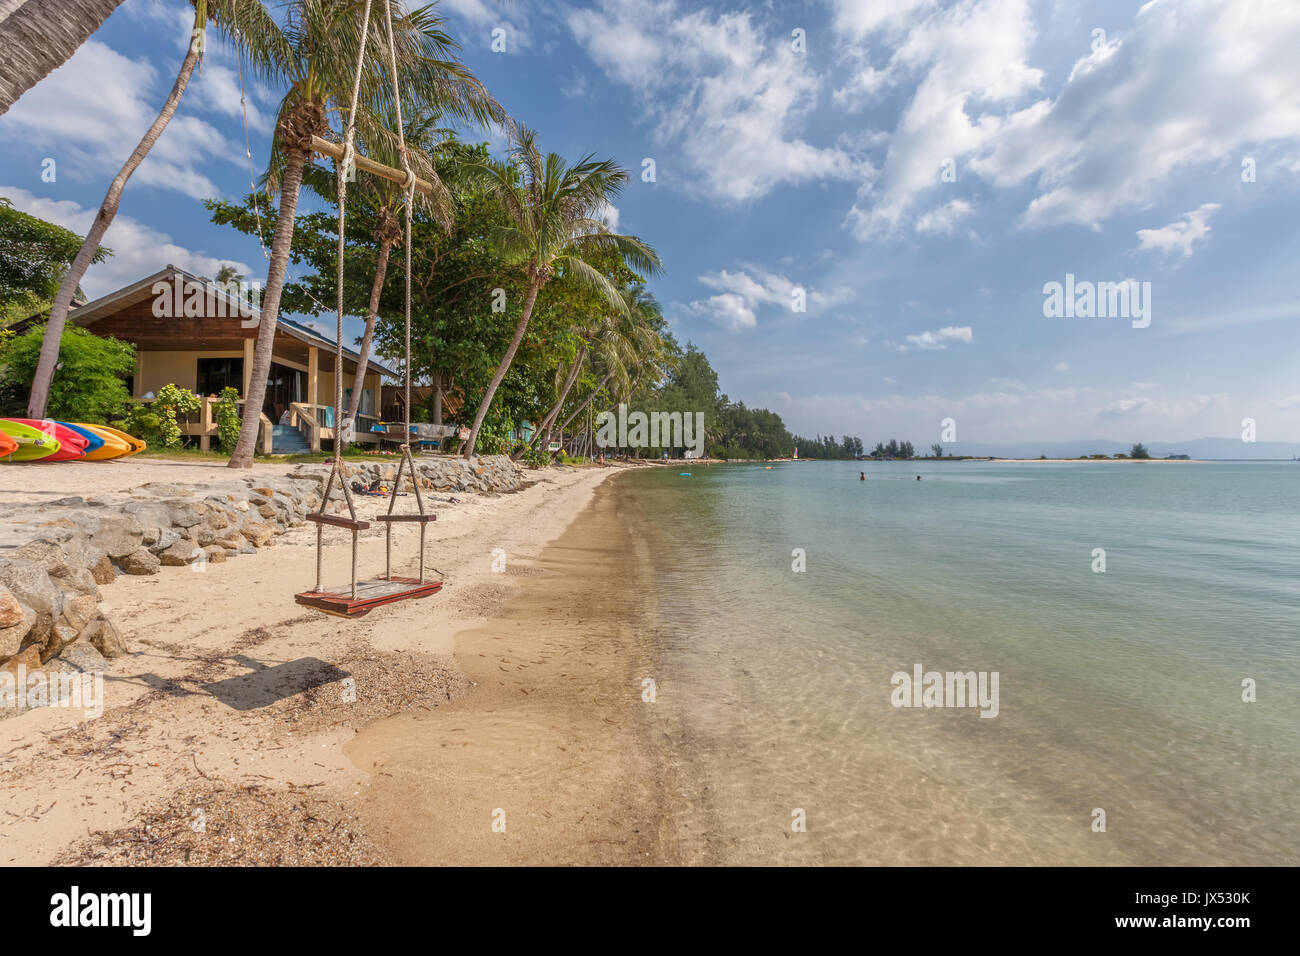 Nai Wok Bay, Koh Phangan, Thailand - Stock Image